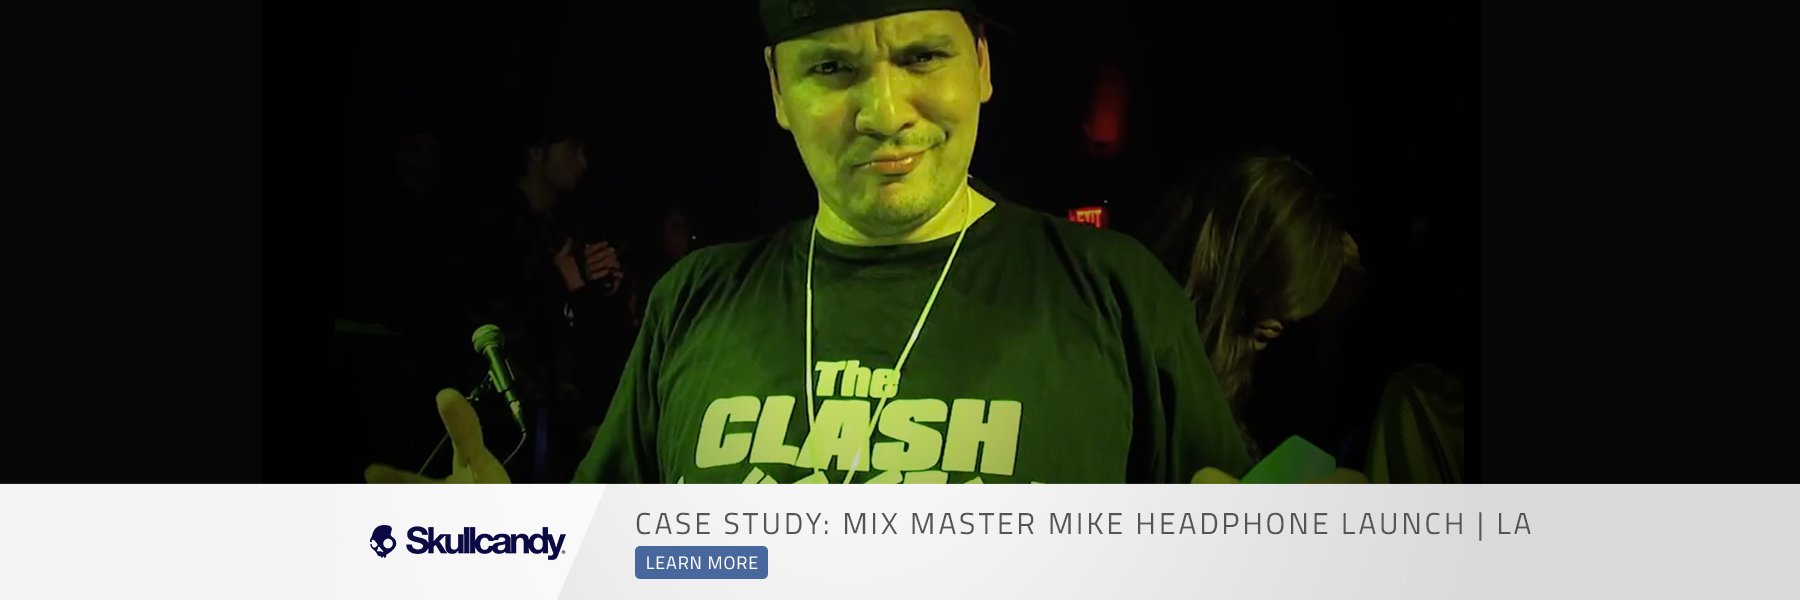 Homepage_CaseStudy_Hero2